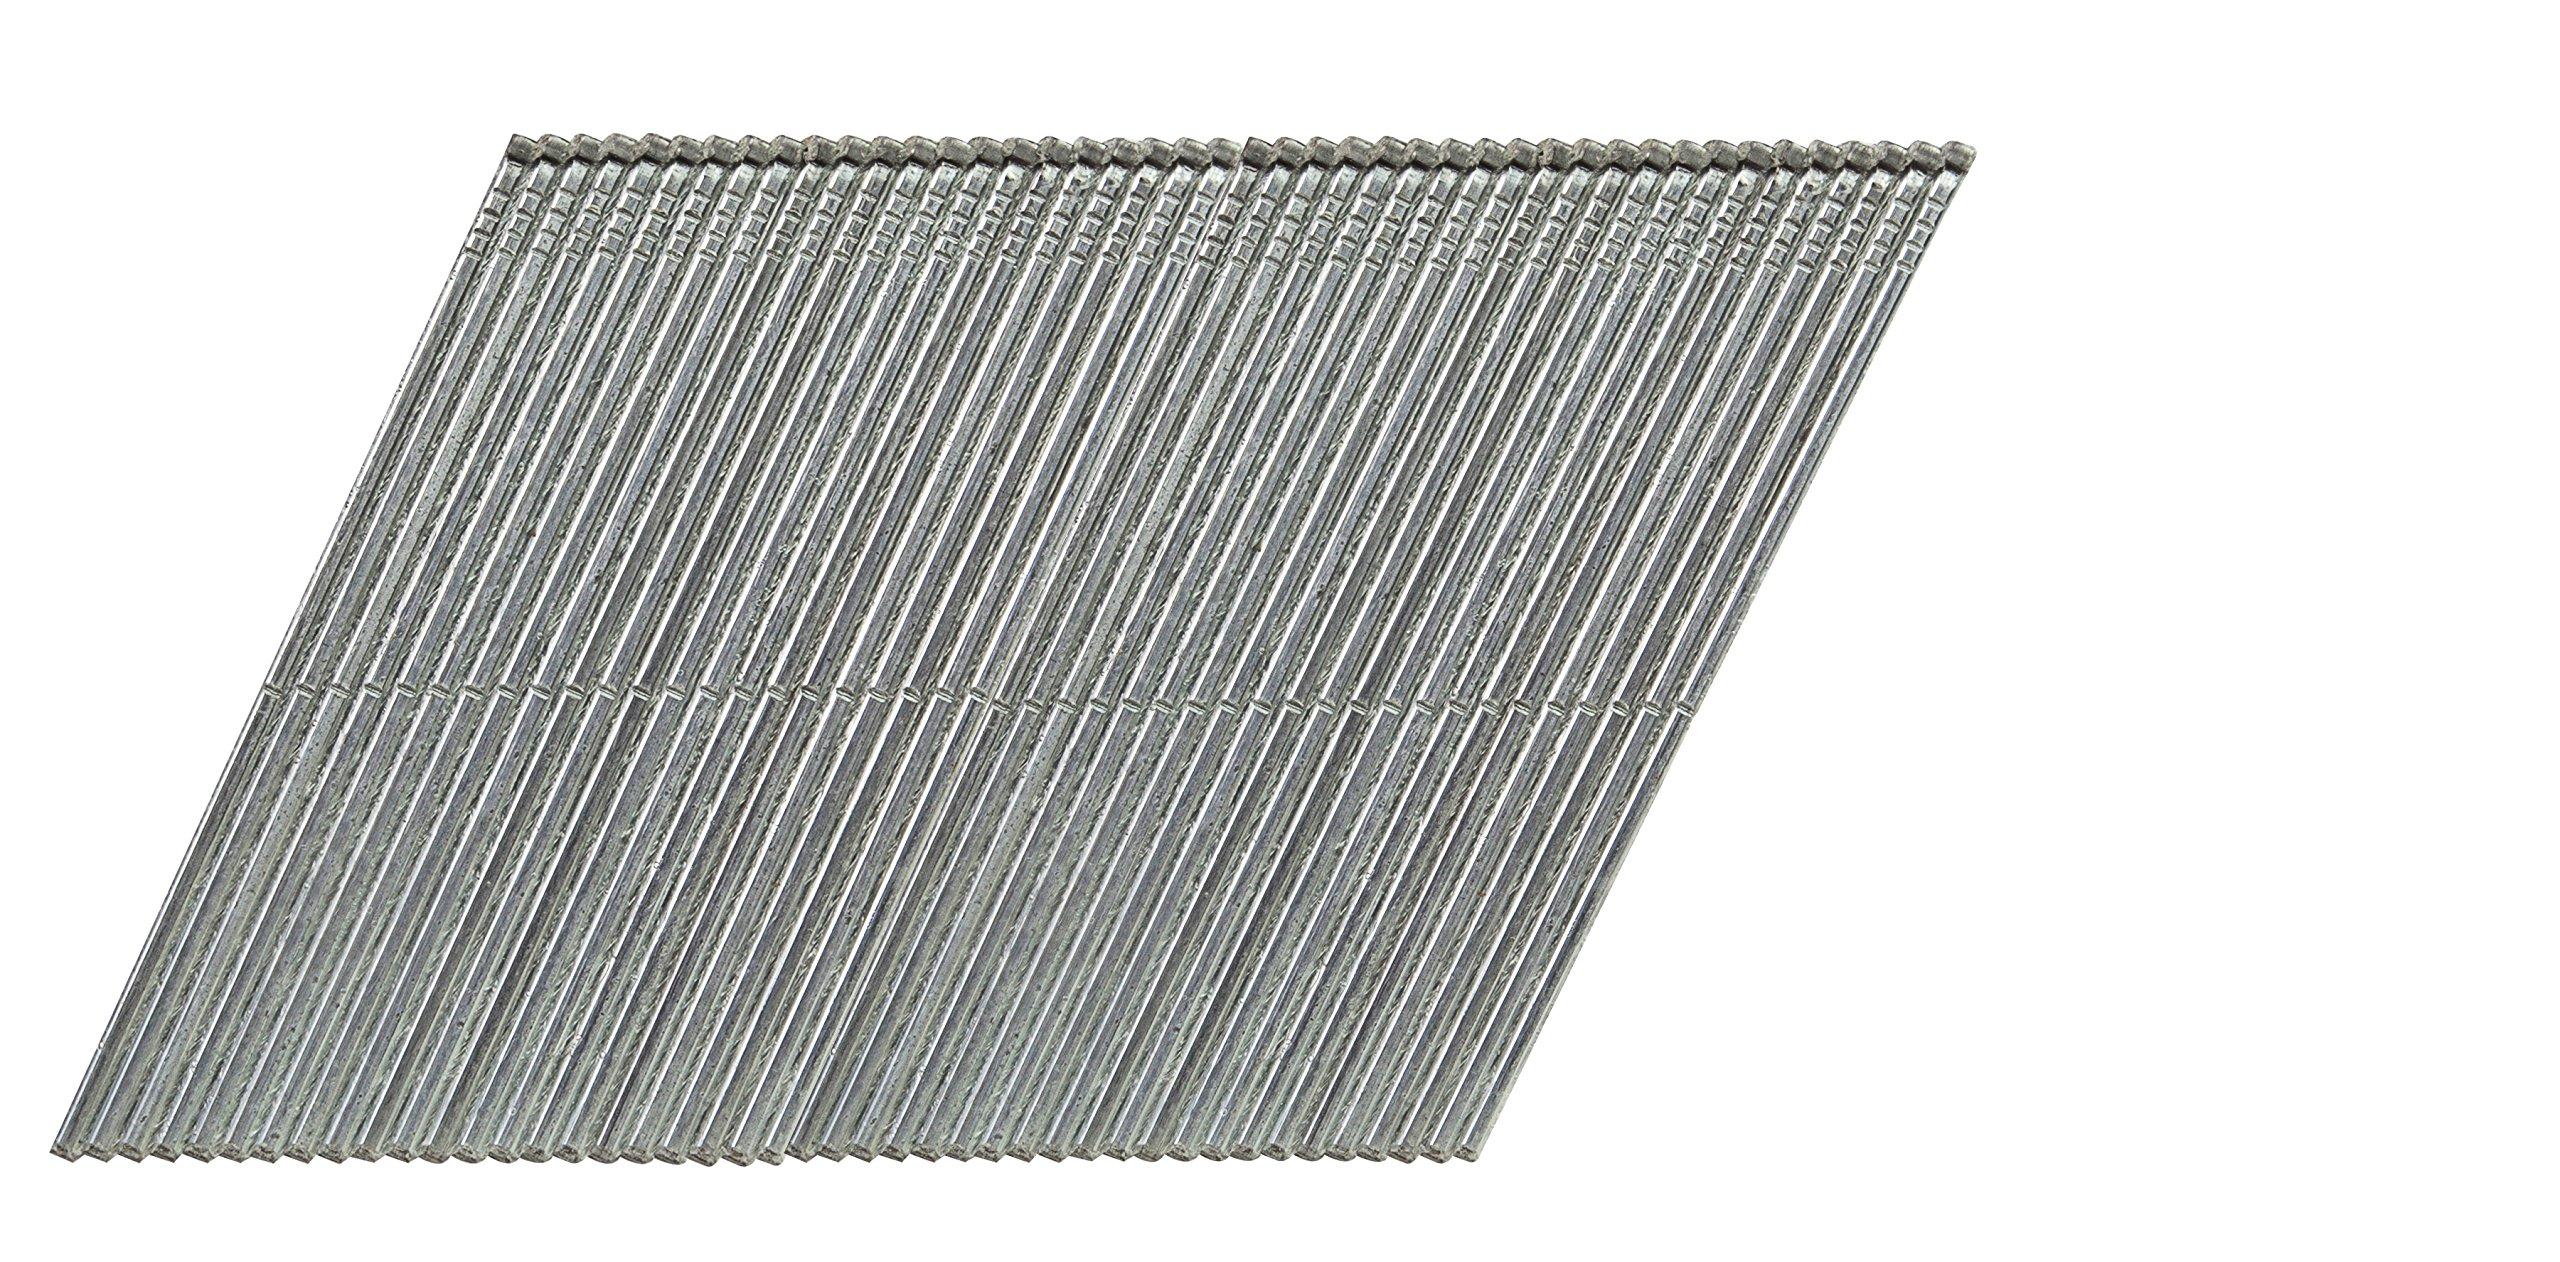 Dewalt DNBA1632SZ SS Head shank nail (2500 Piece), 32mm